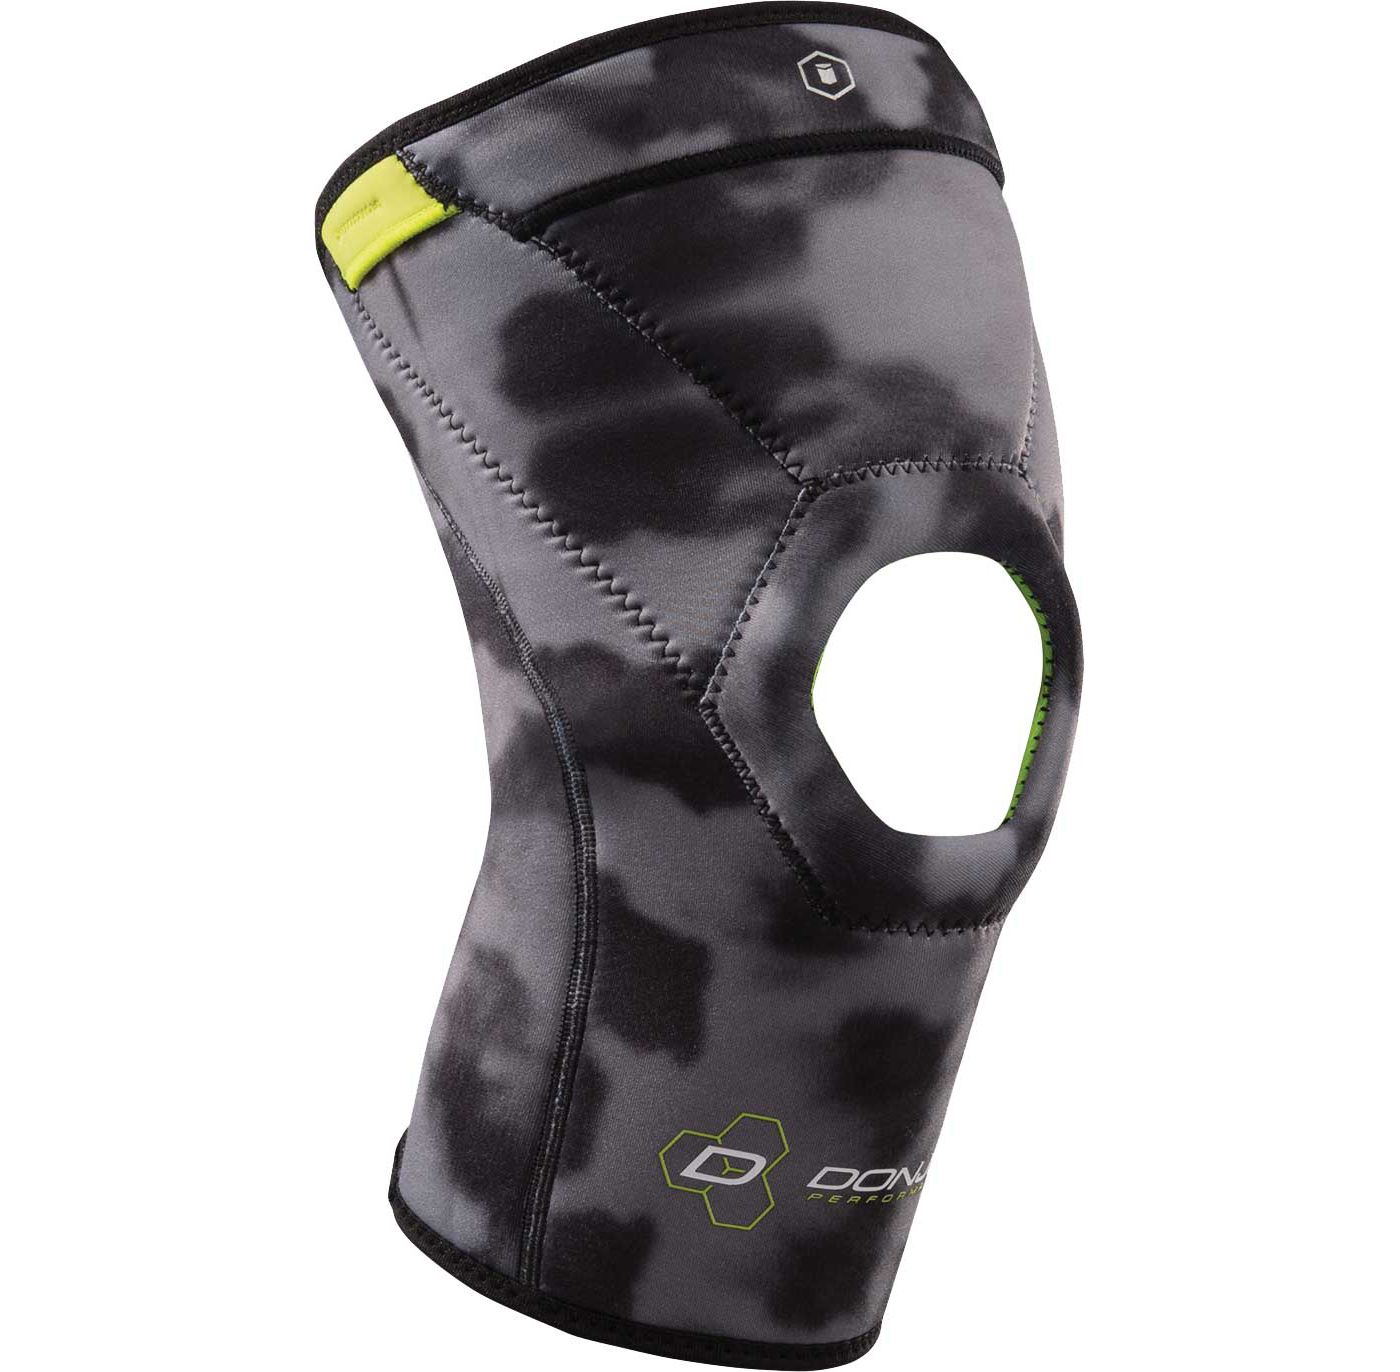 DonJoy Performance Anaform 4MM Knee Sleeve